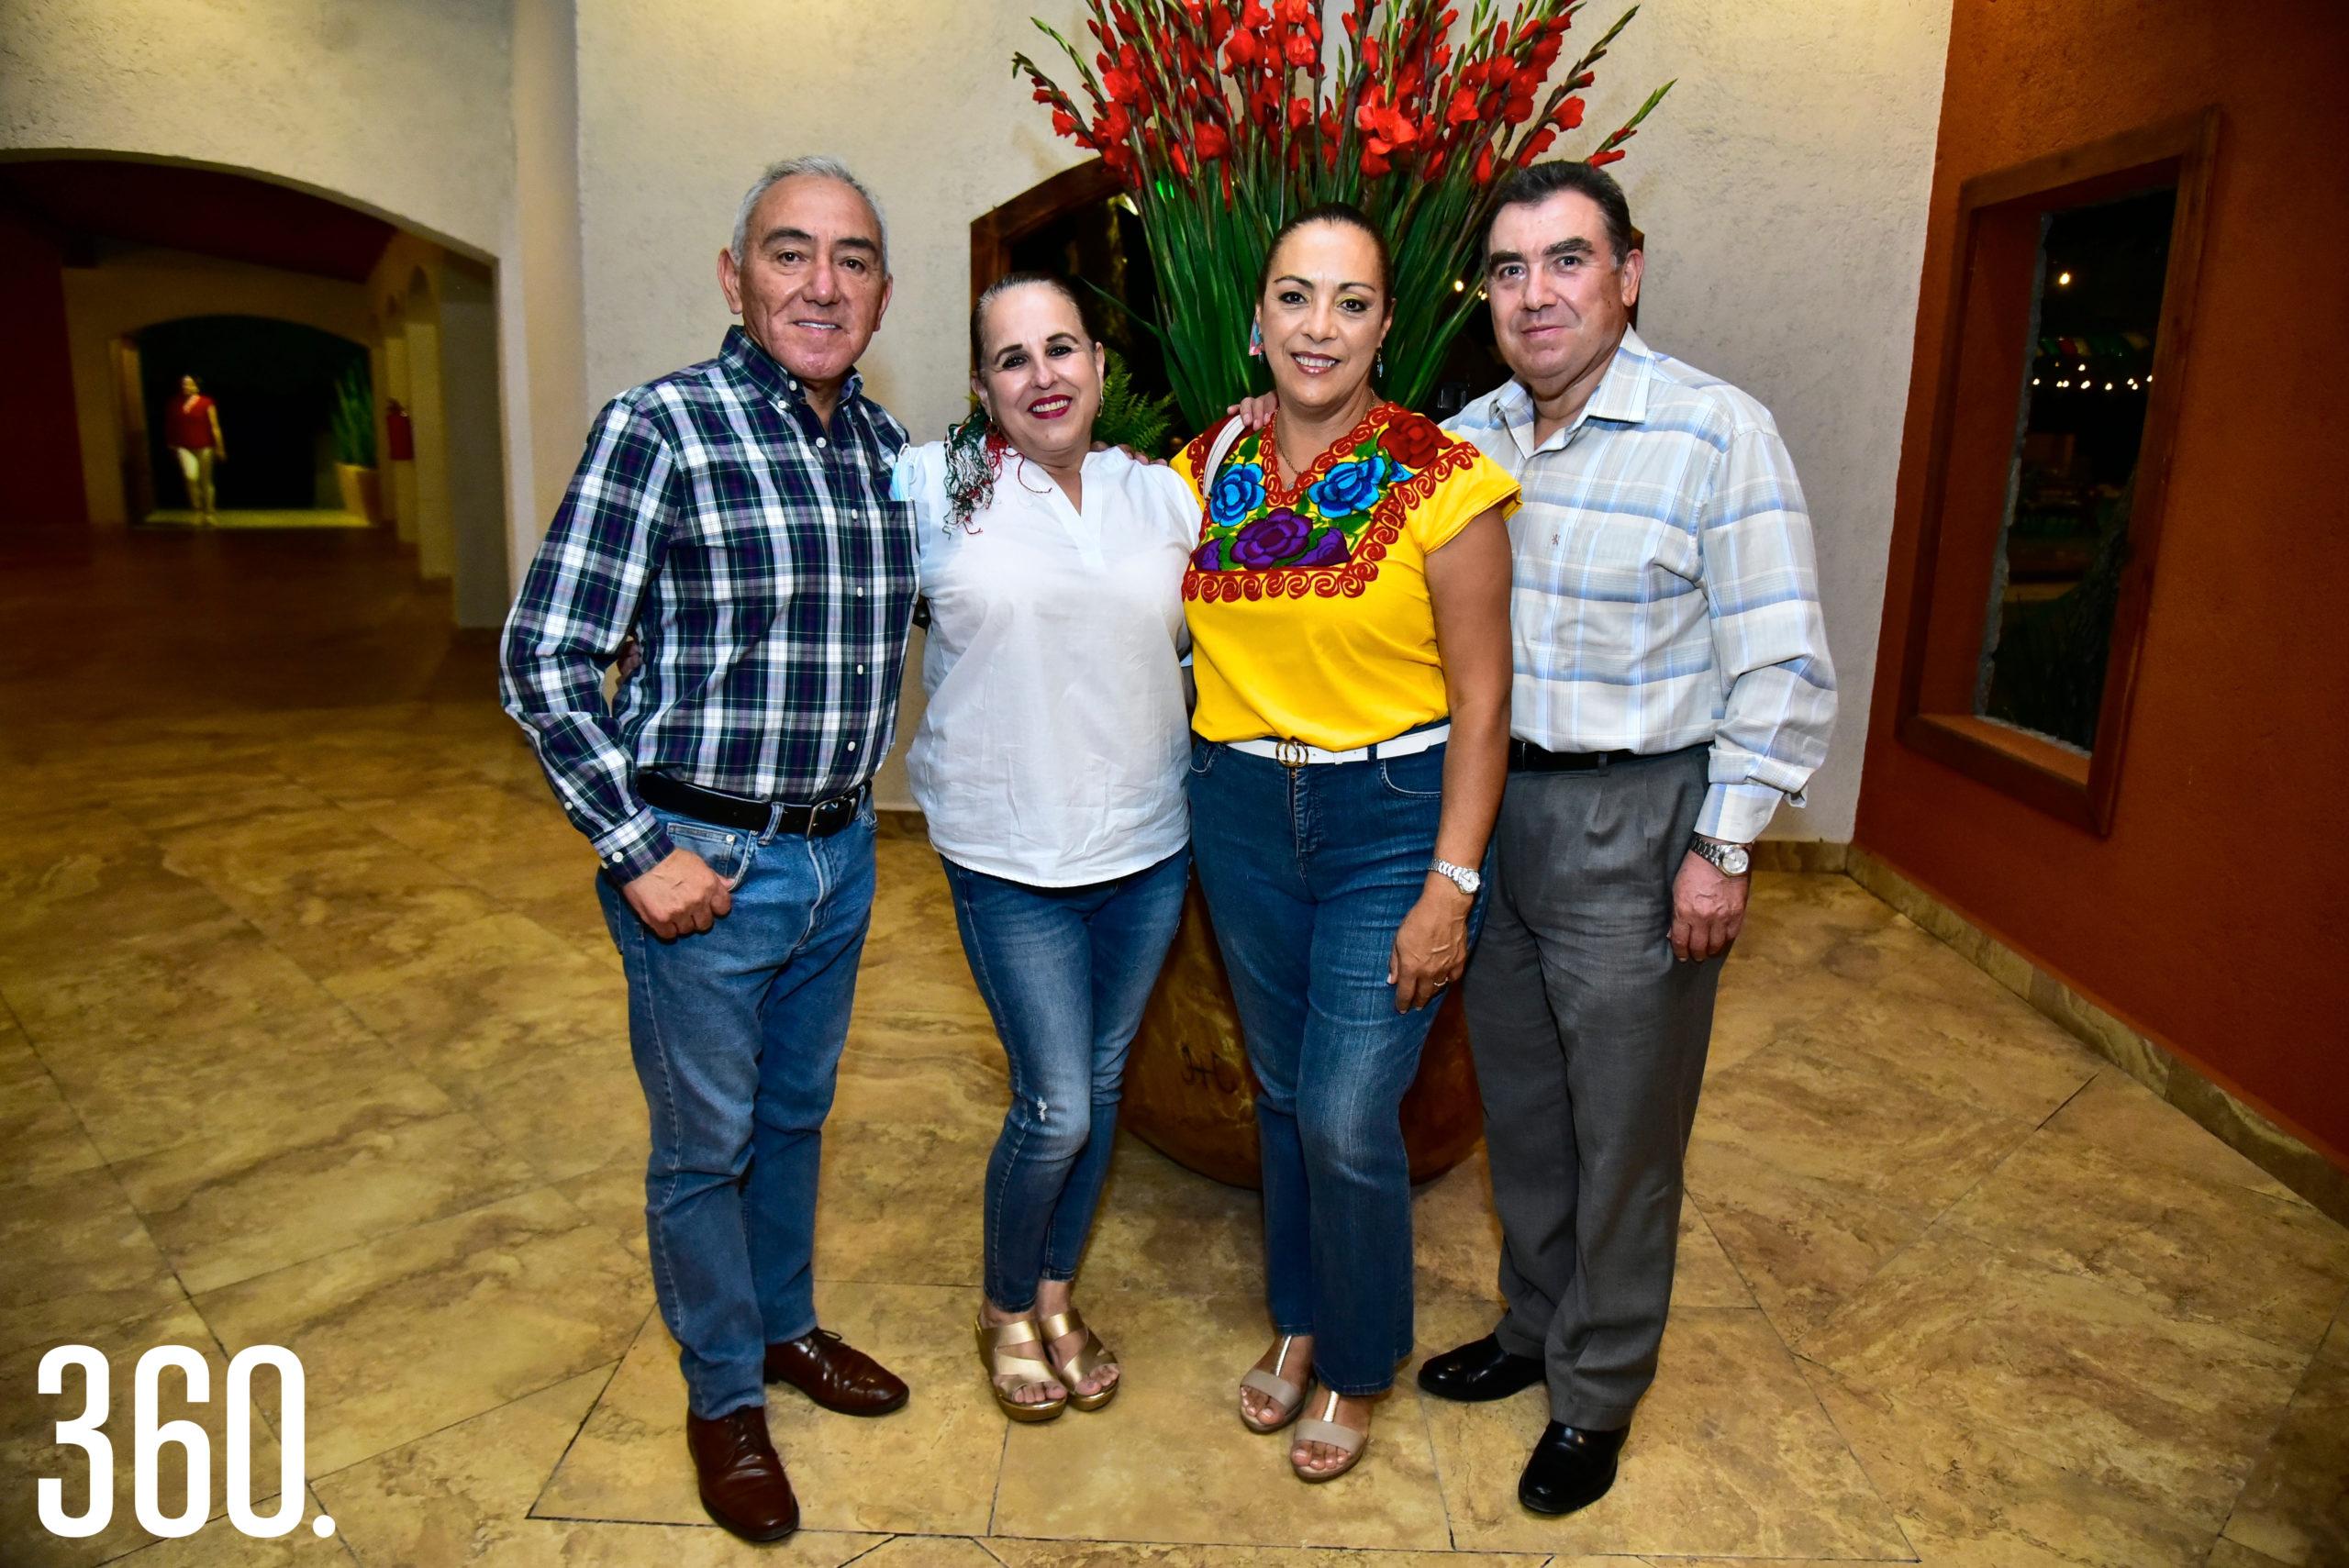 Javier Ramírez, Artemisa Ortegón, Luz Elena Berrueto y Arnoldo Molina.